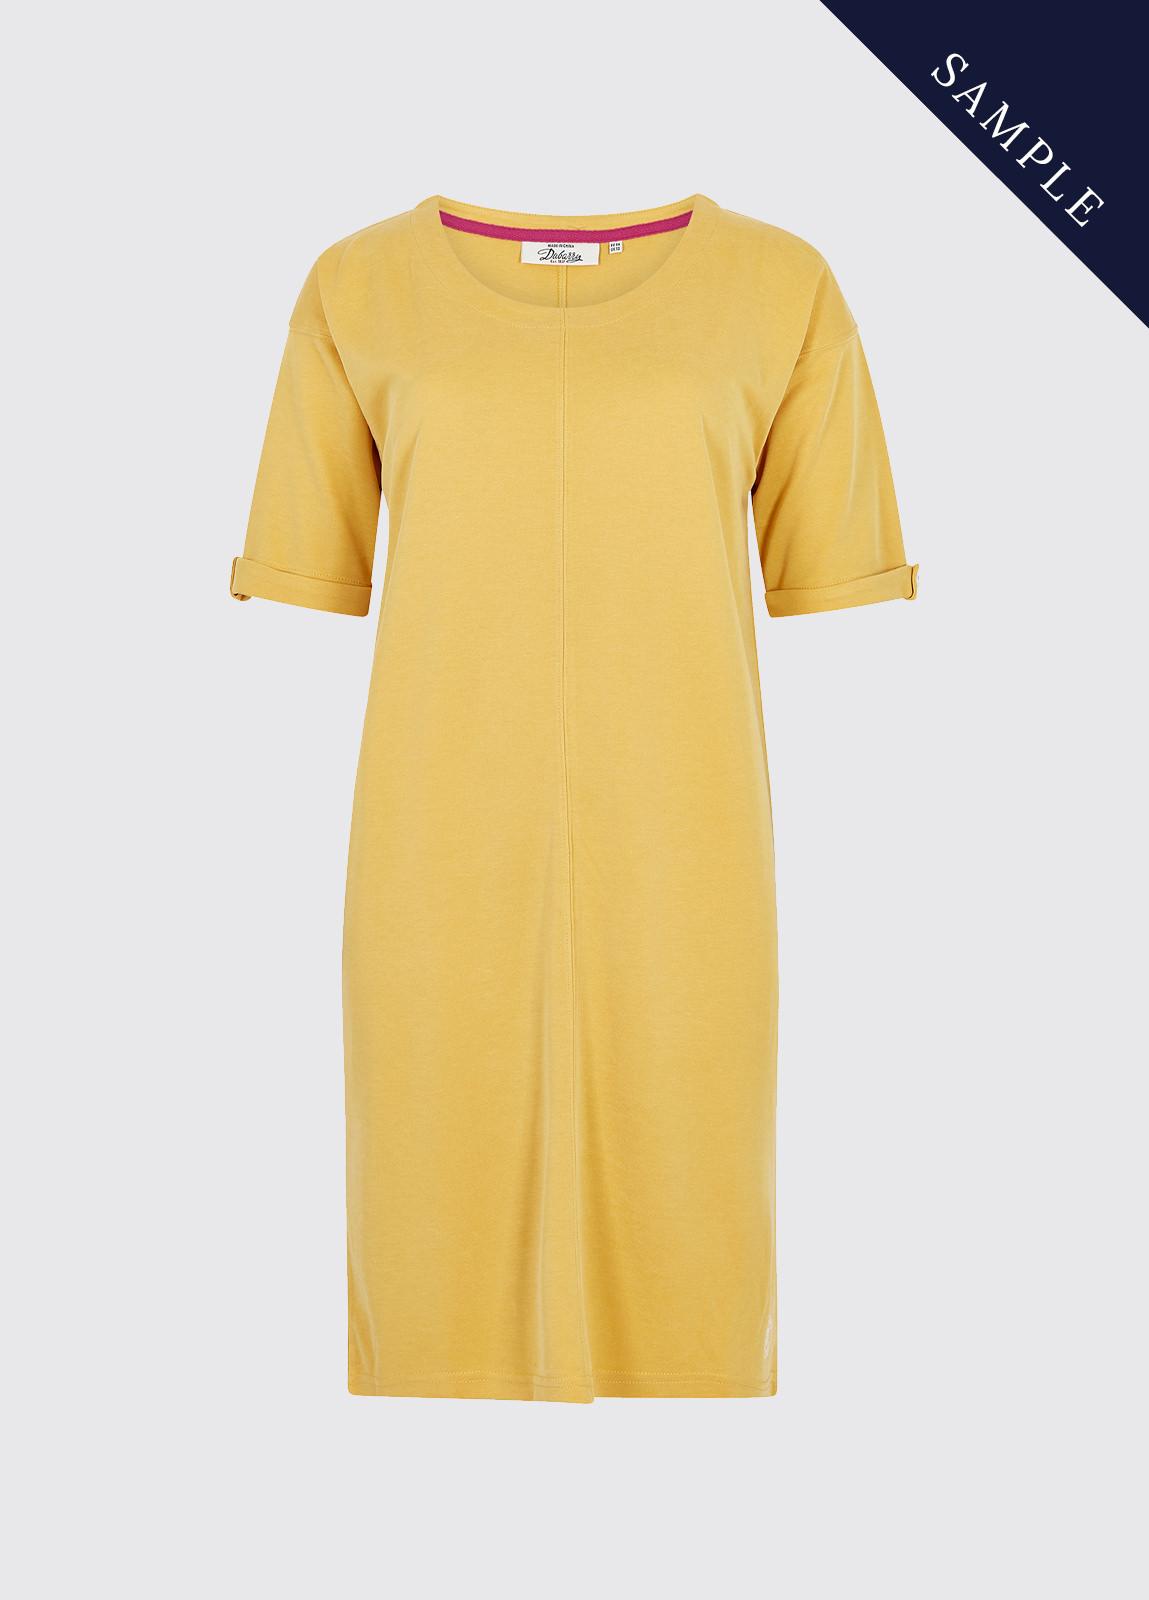 Coolbeg Tunic Dress - Sunflower - EU 36